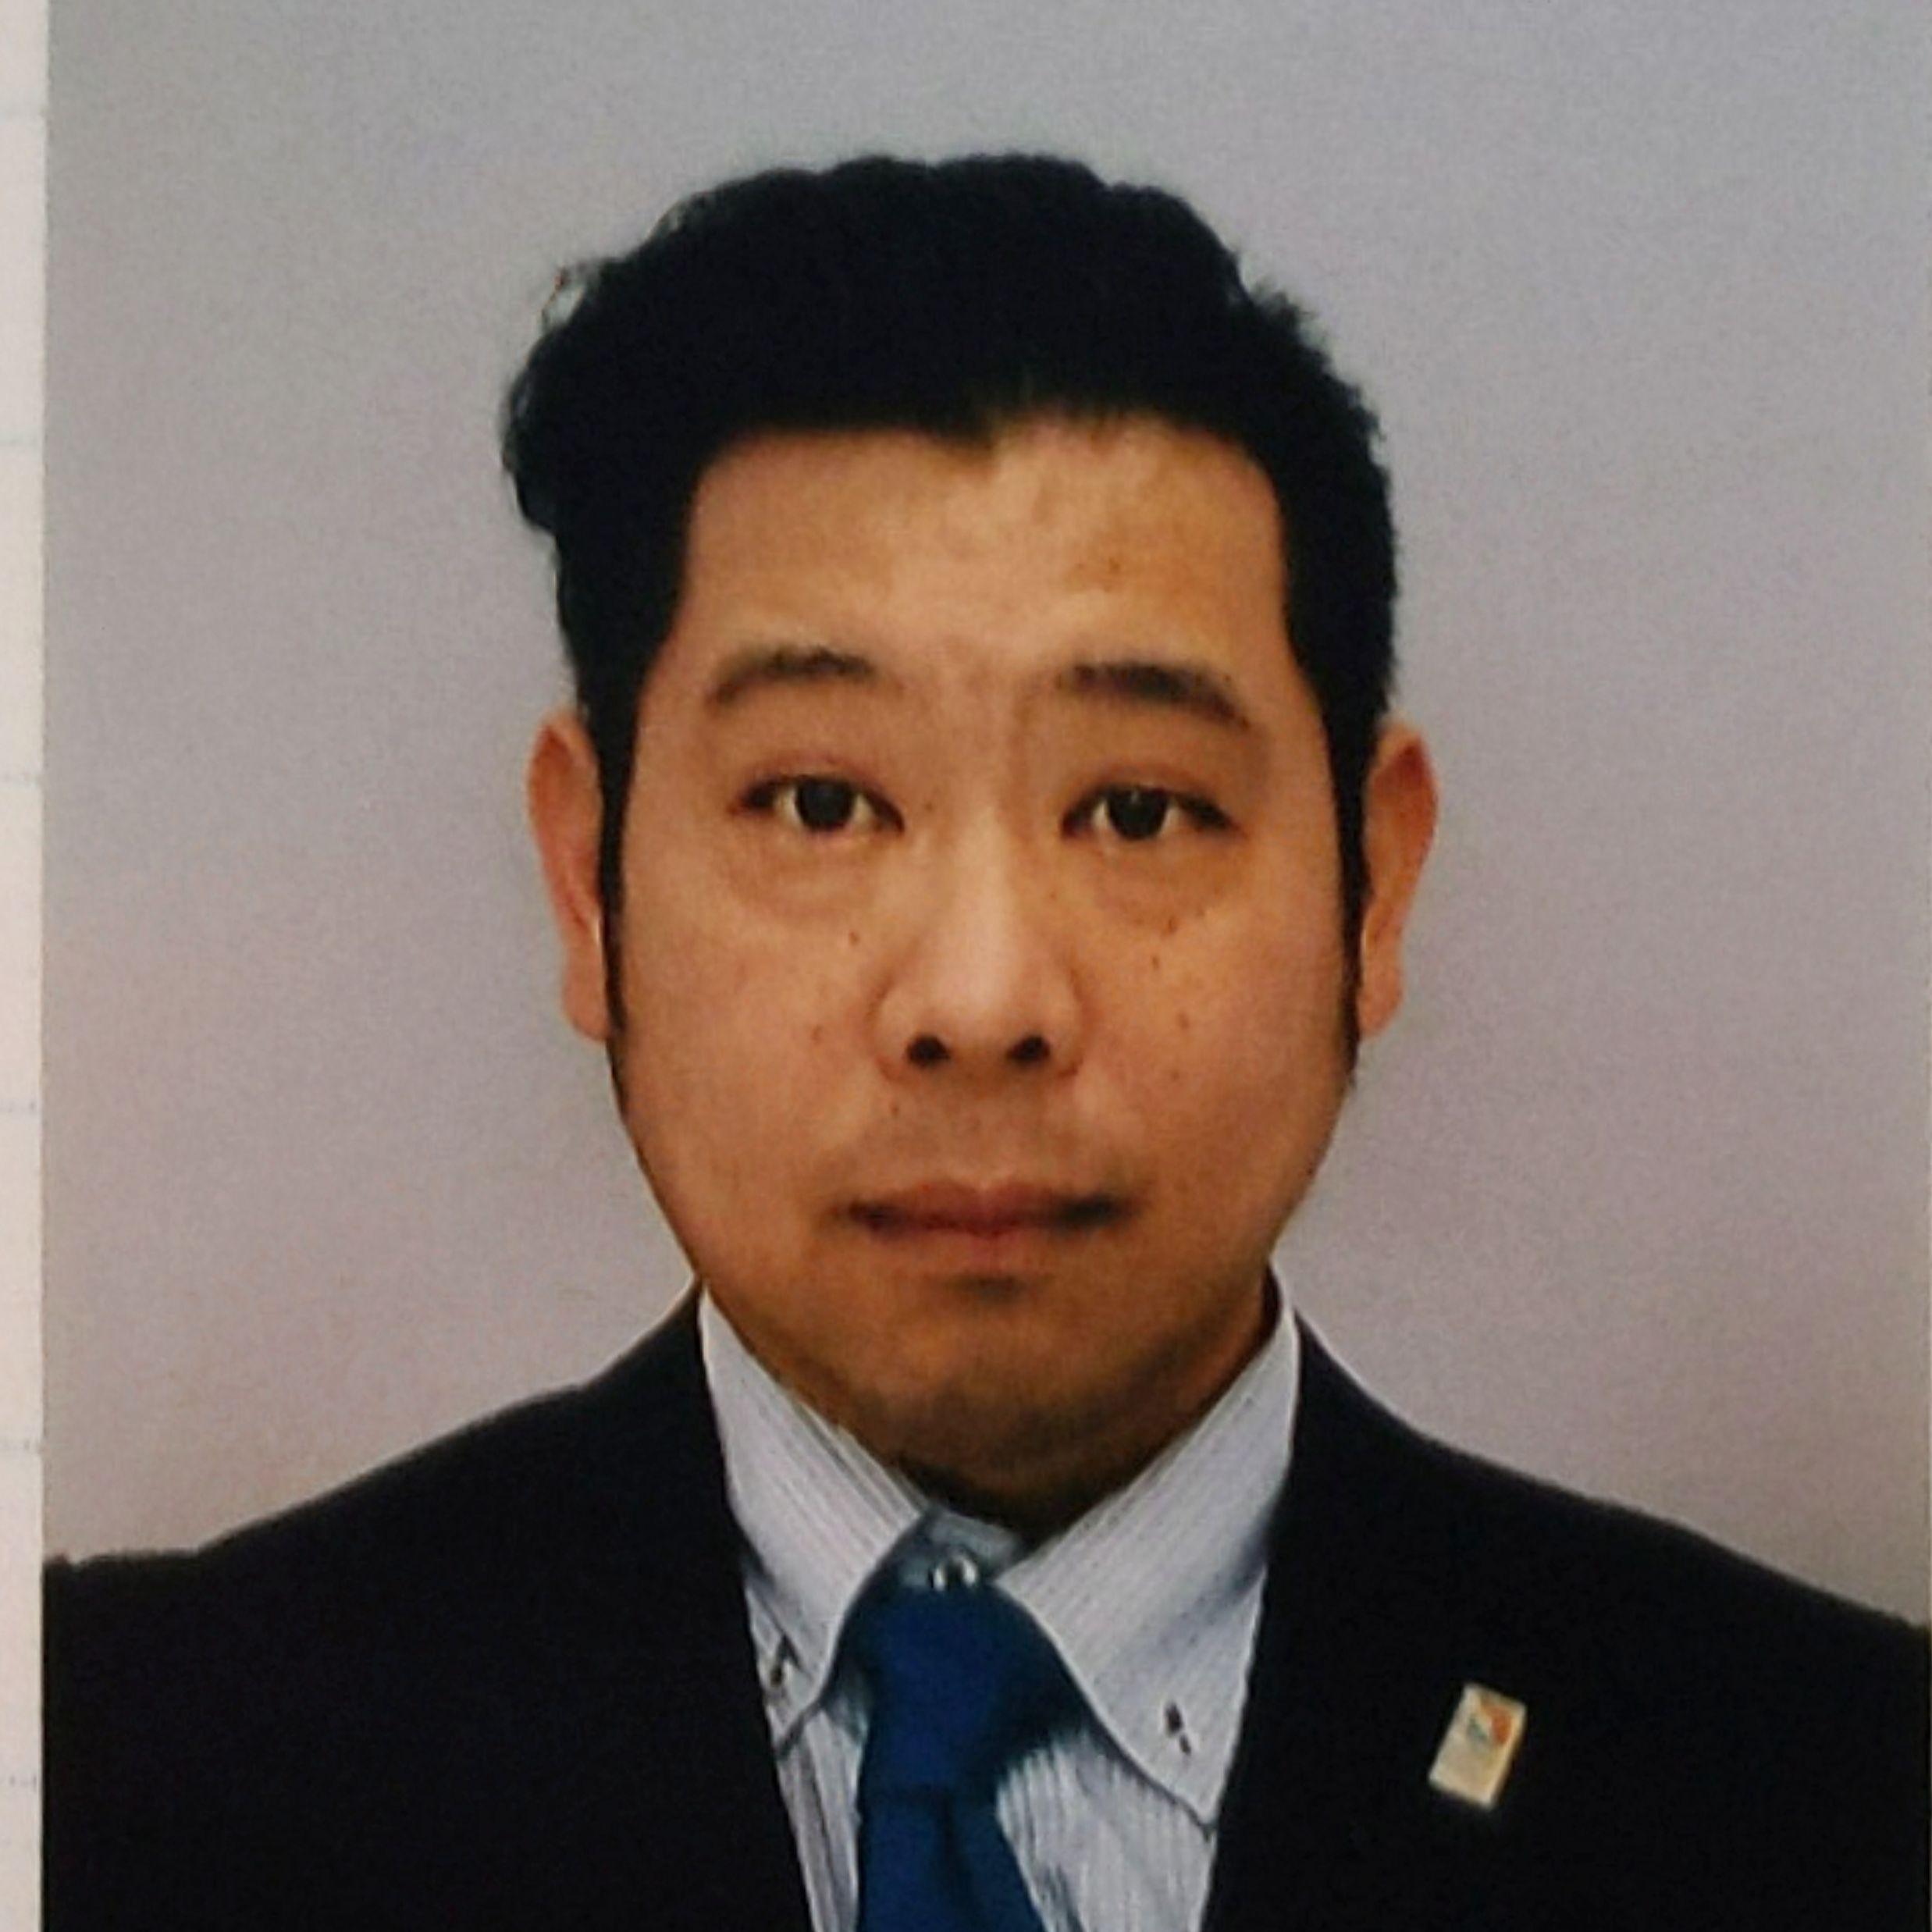 Takuro Moriyama